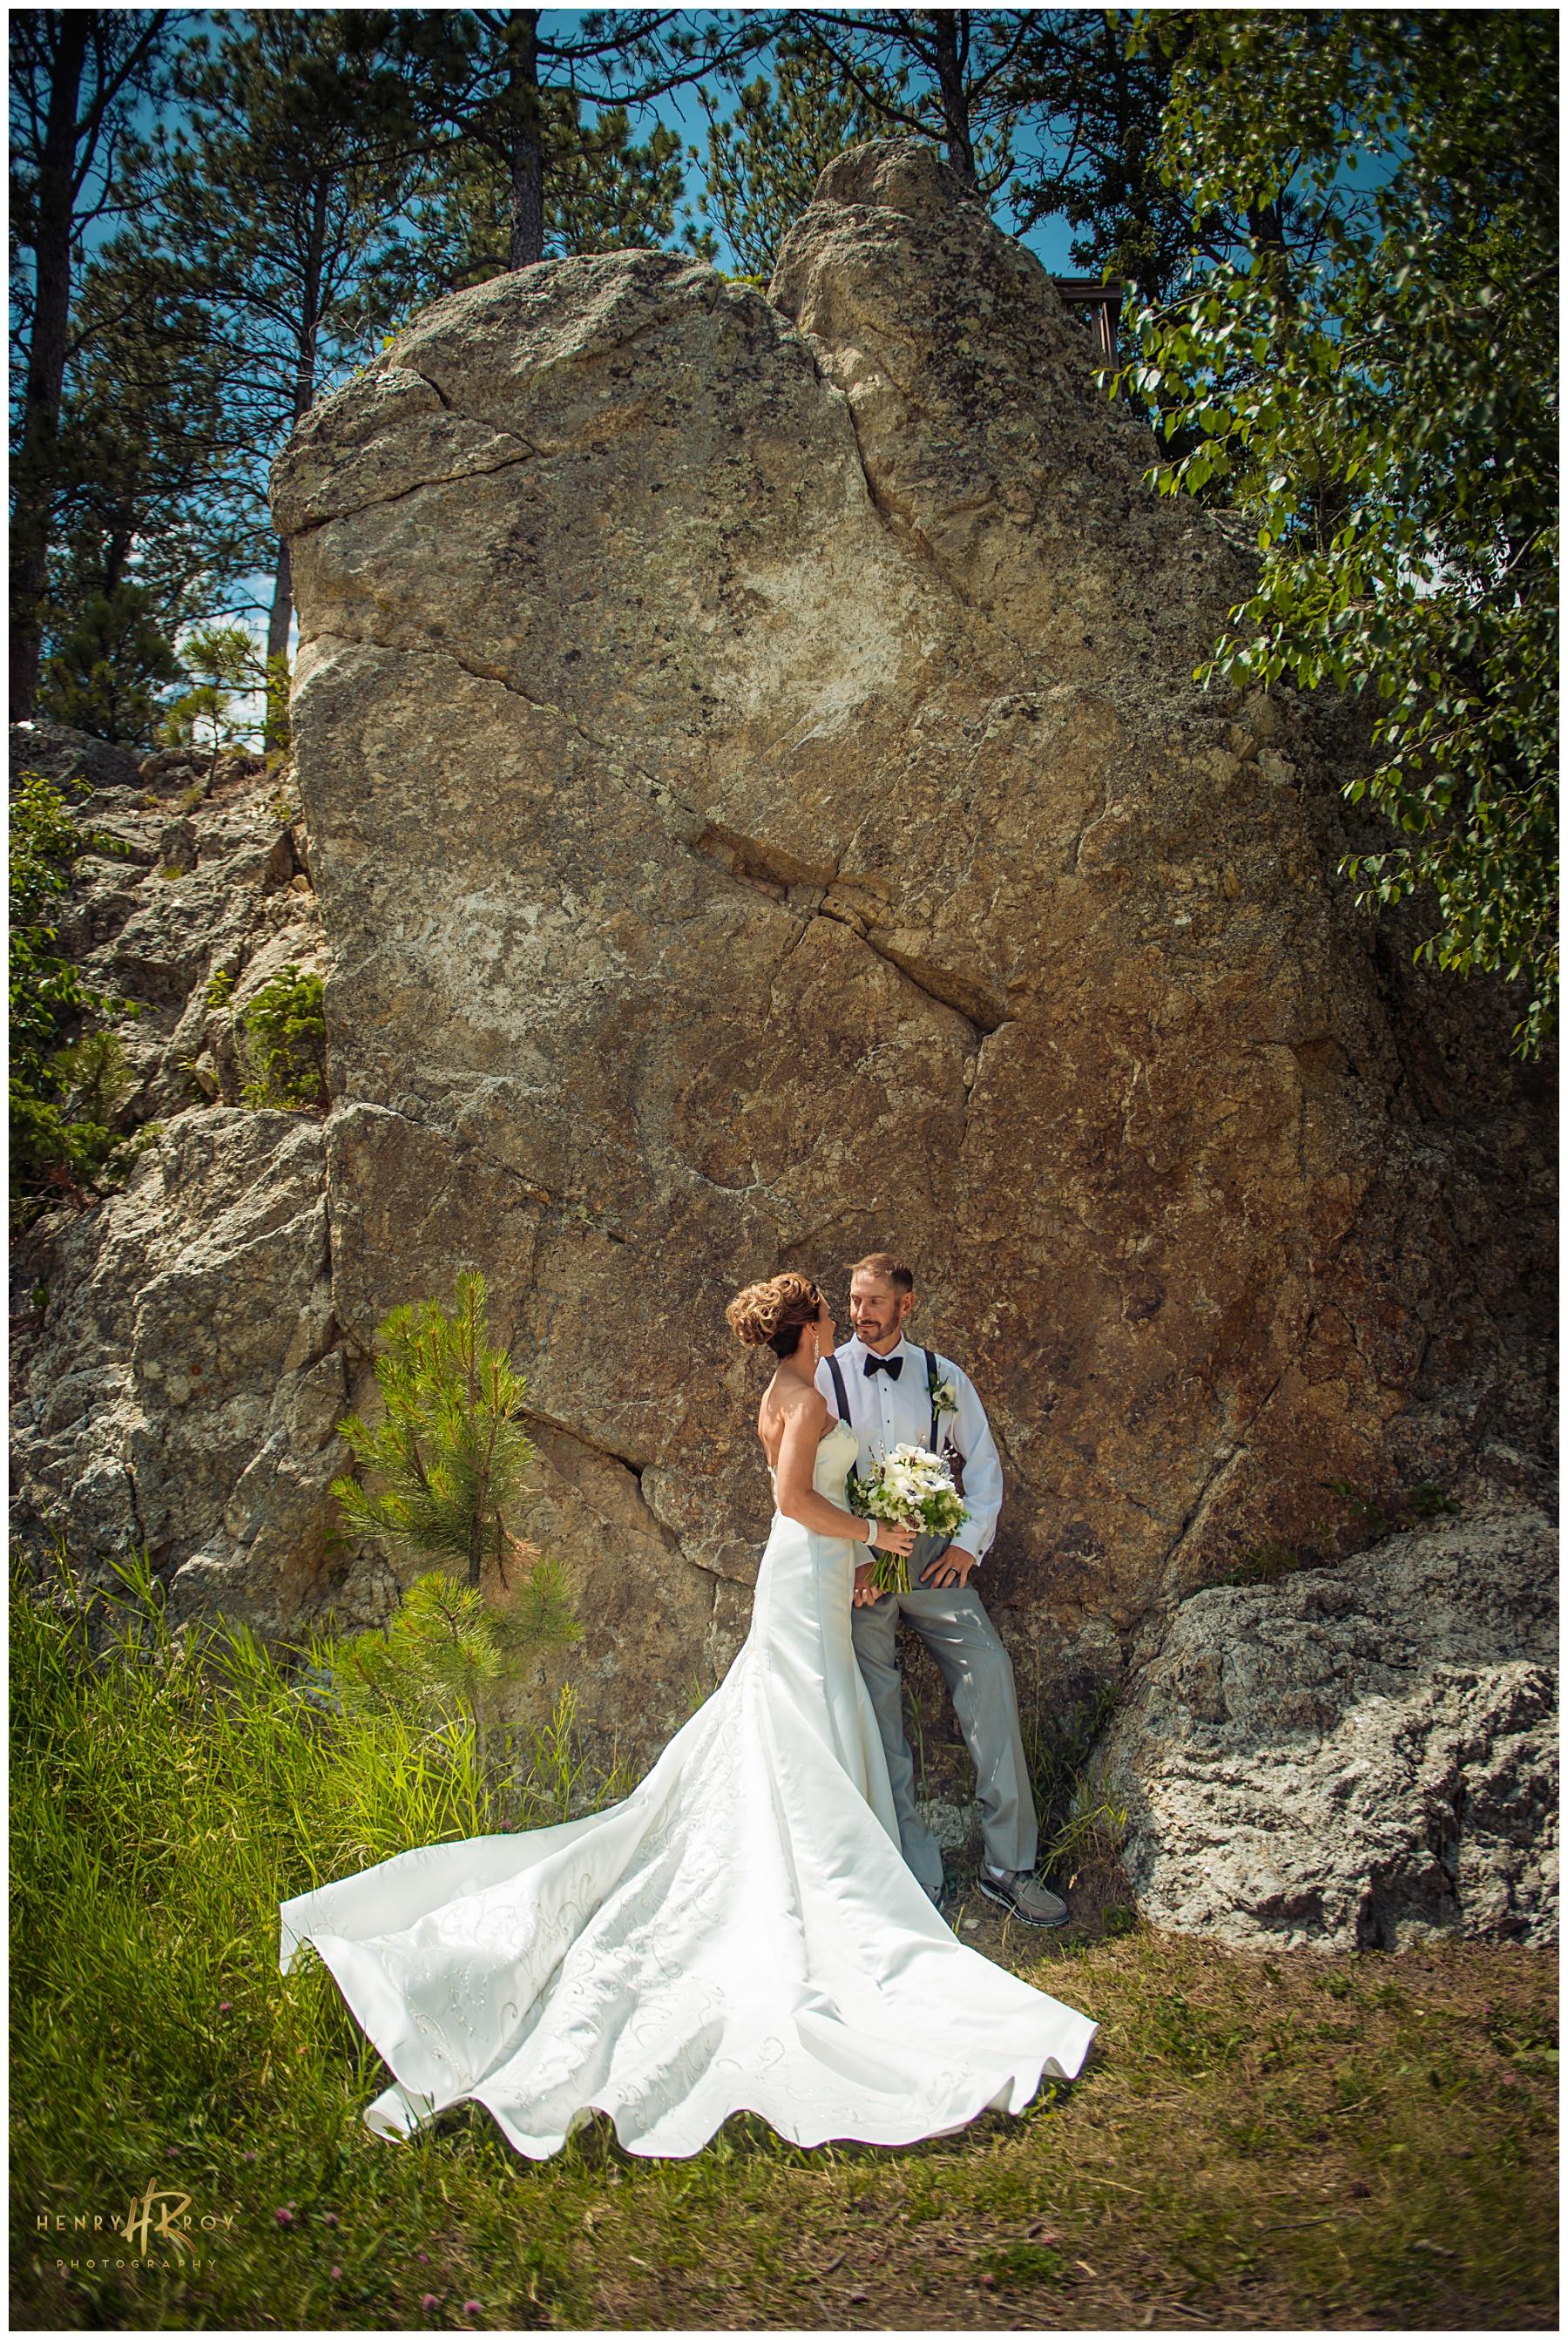 Wedding Photographer020.jpg